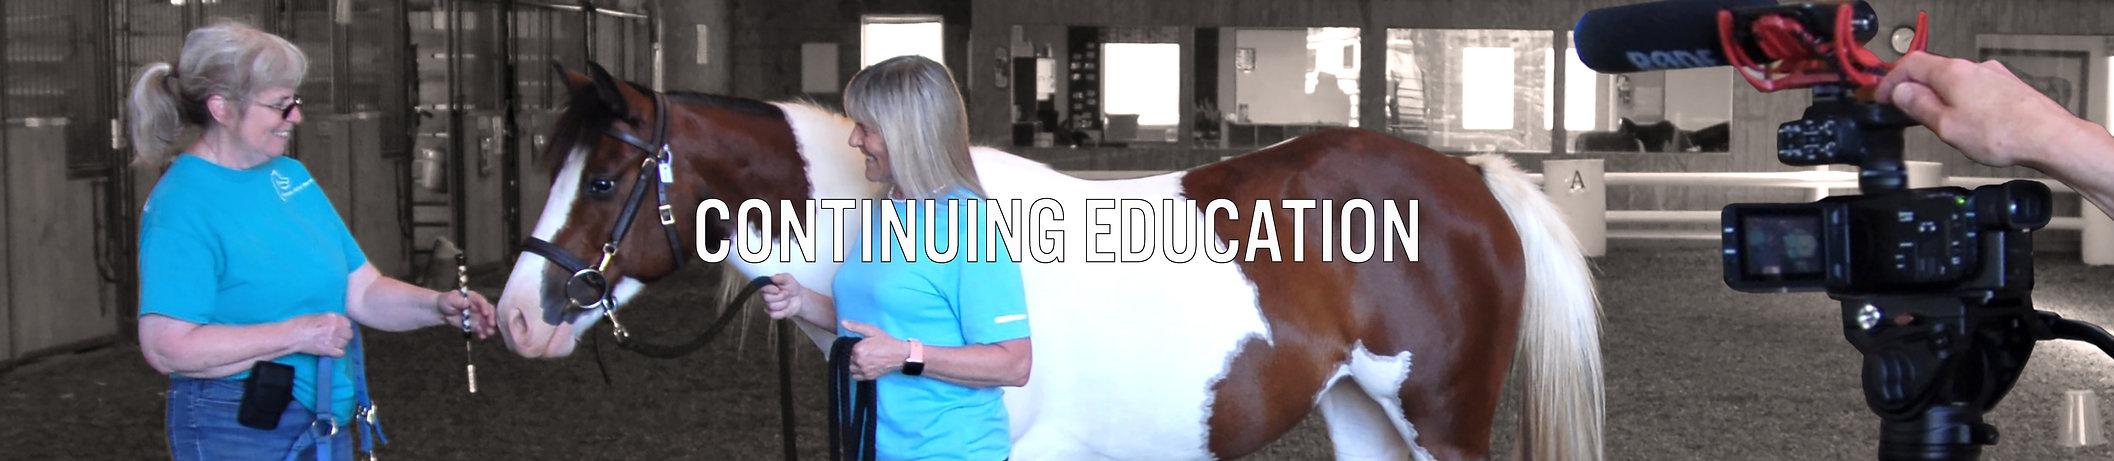 Continuing Education.jpg